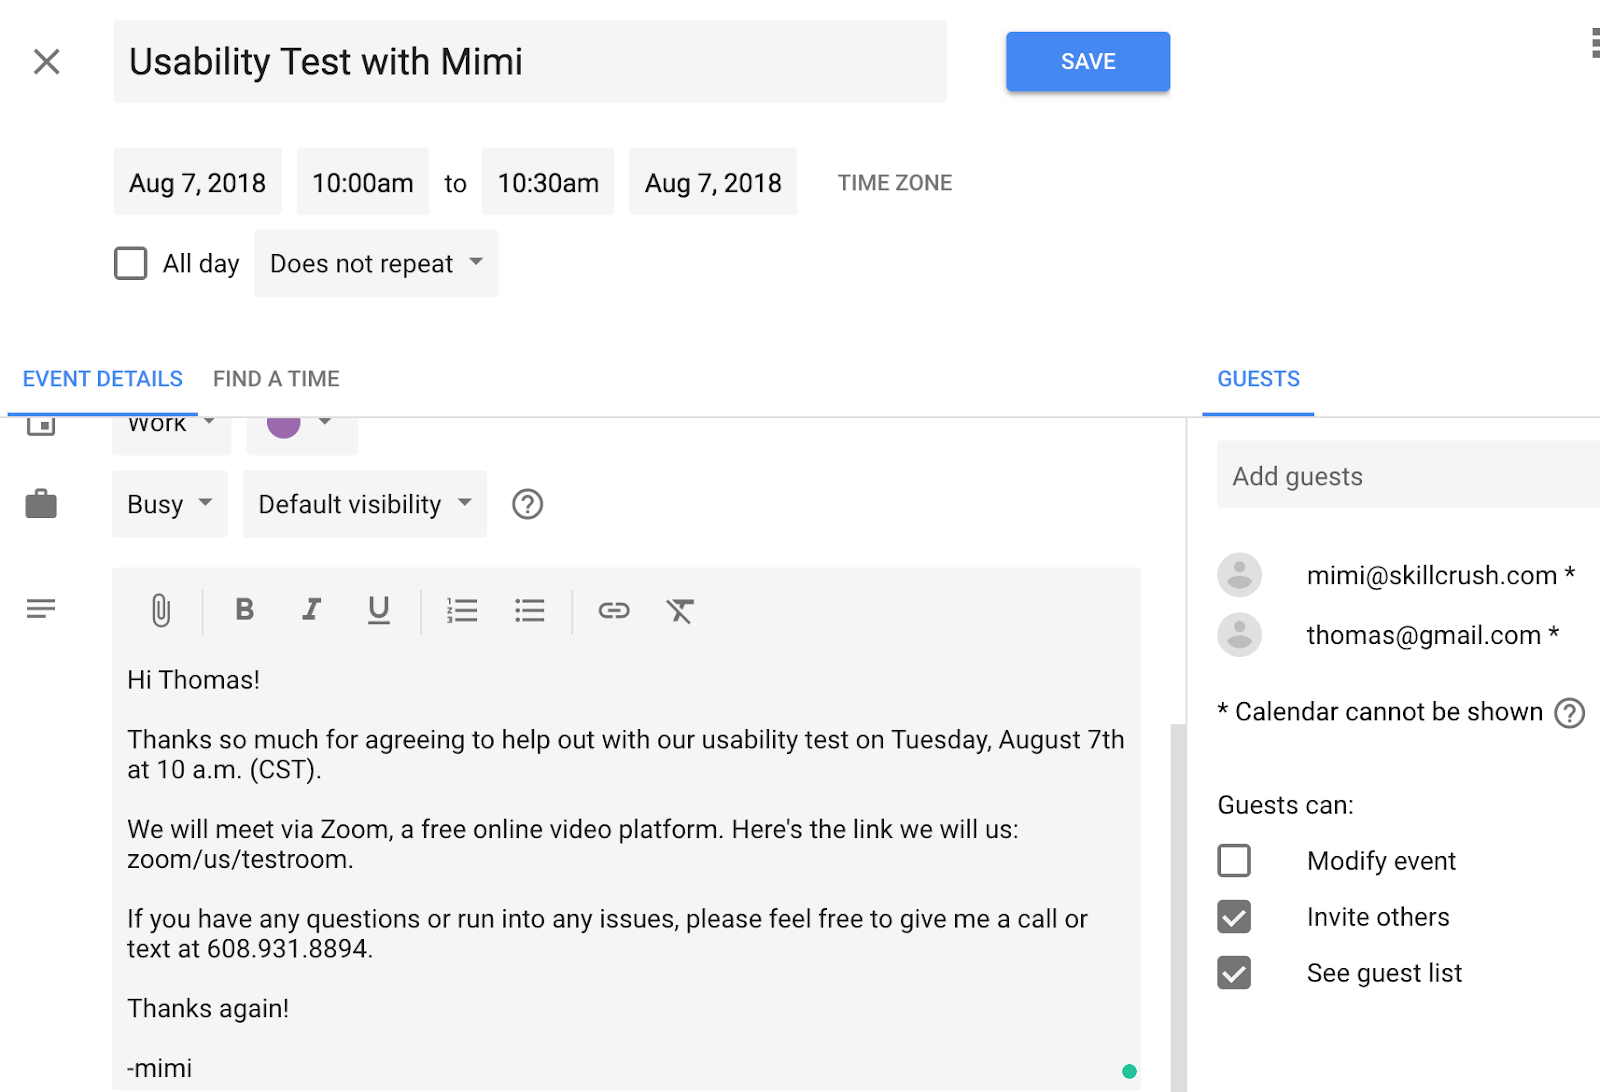 Create & Send an Invite with Google Calendar - Skillcrush FAQs